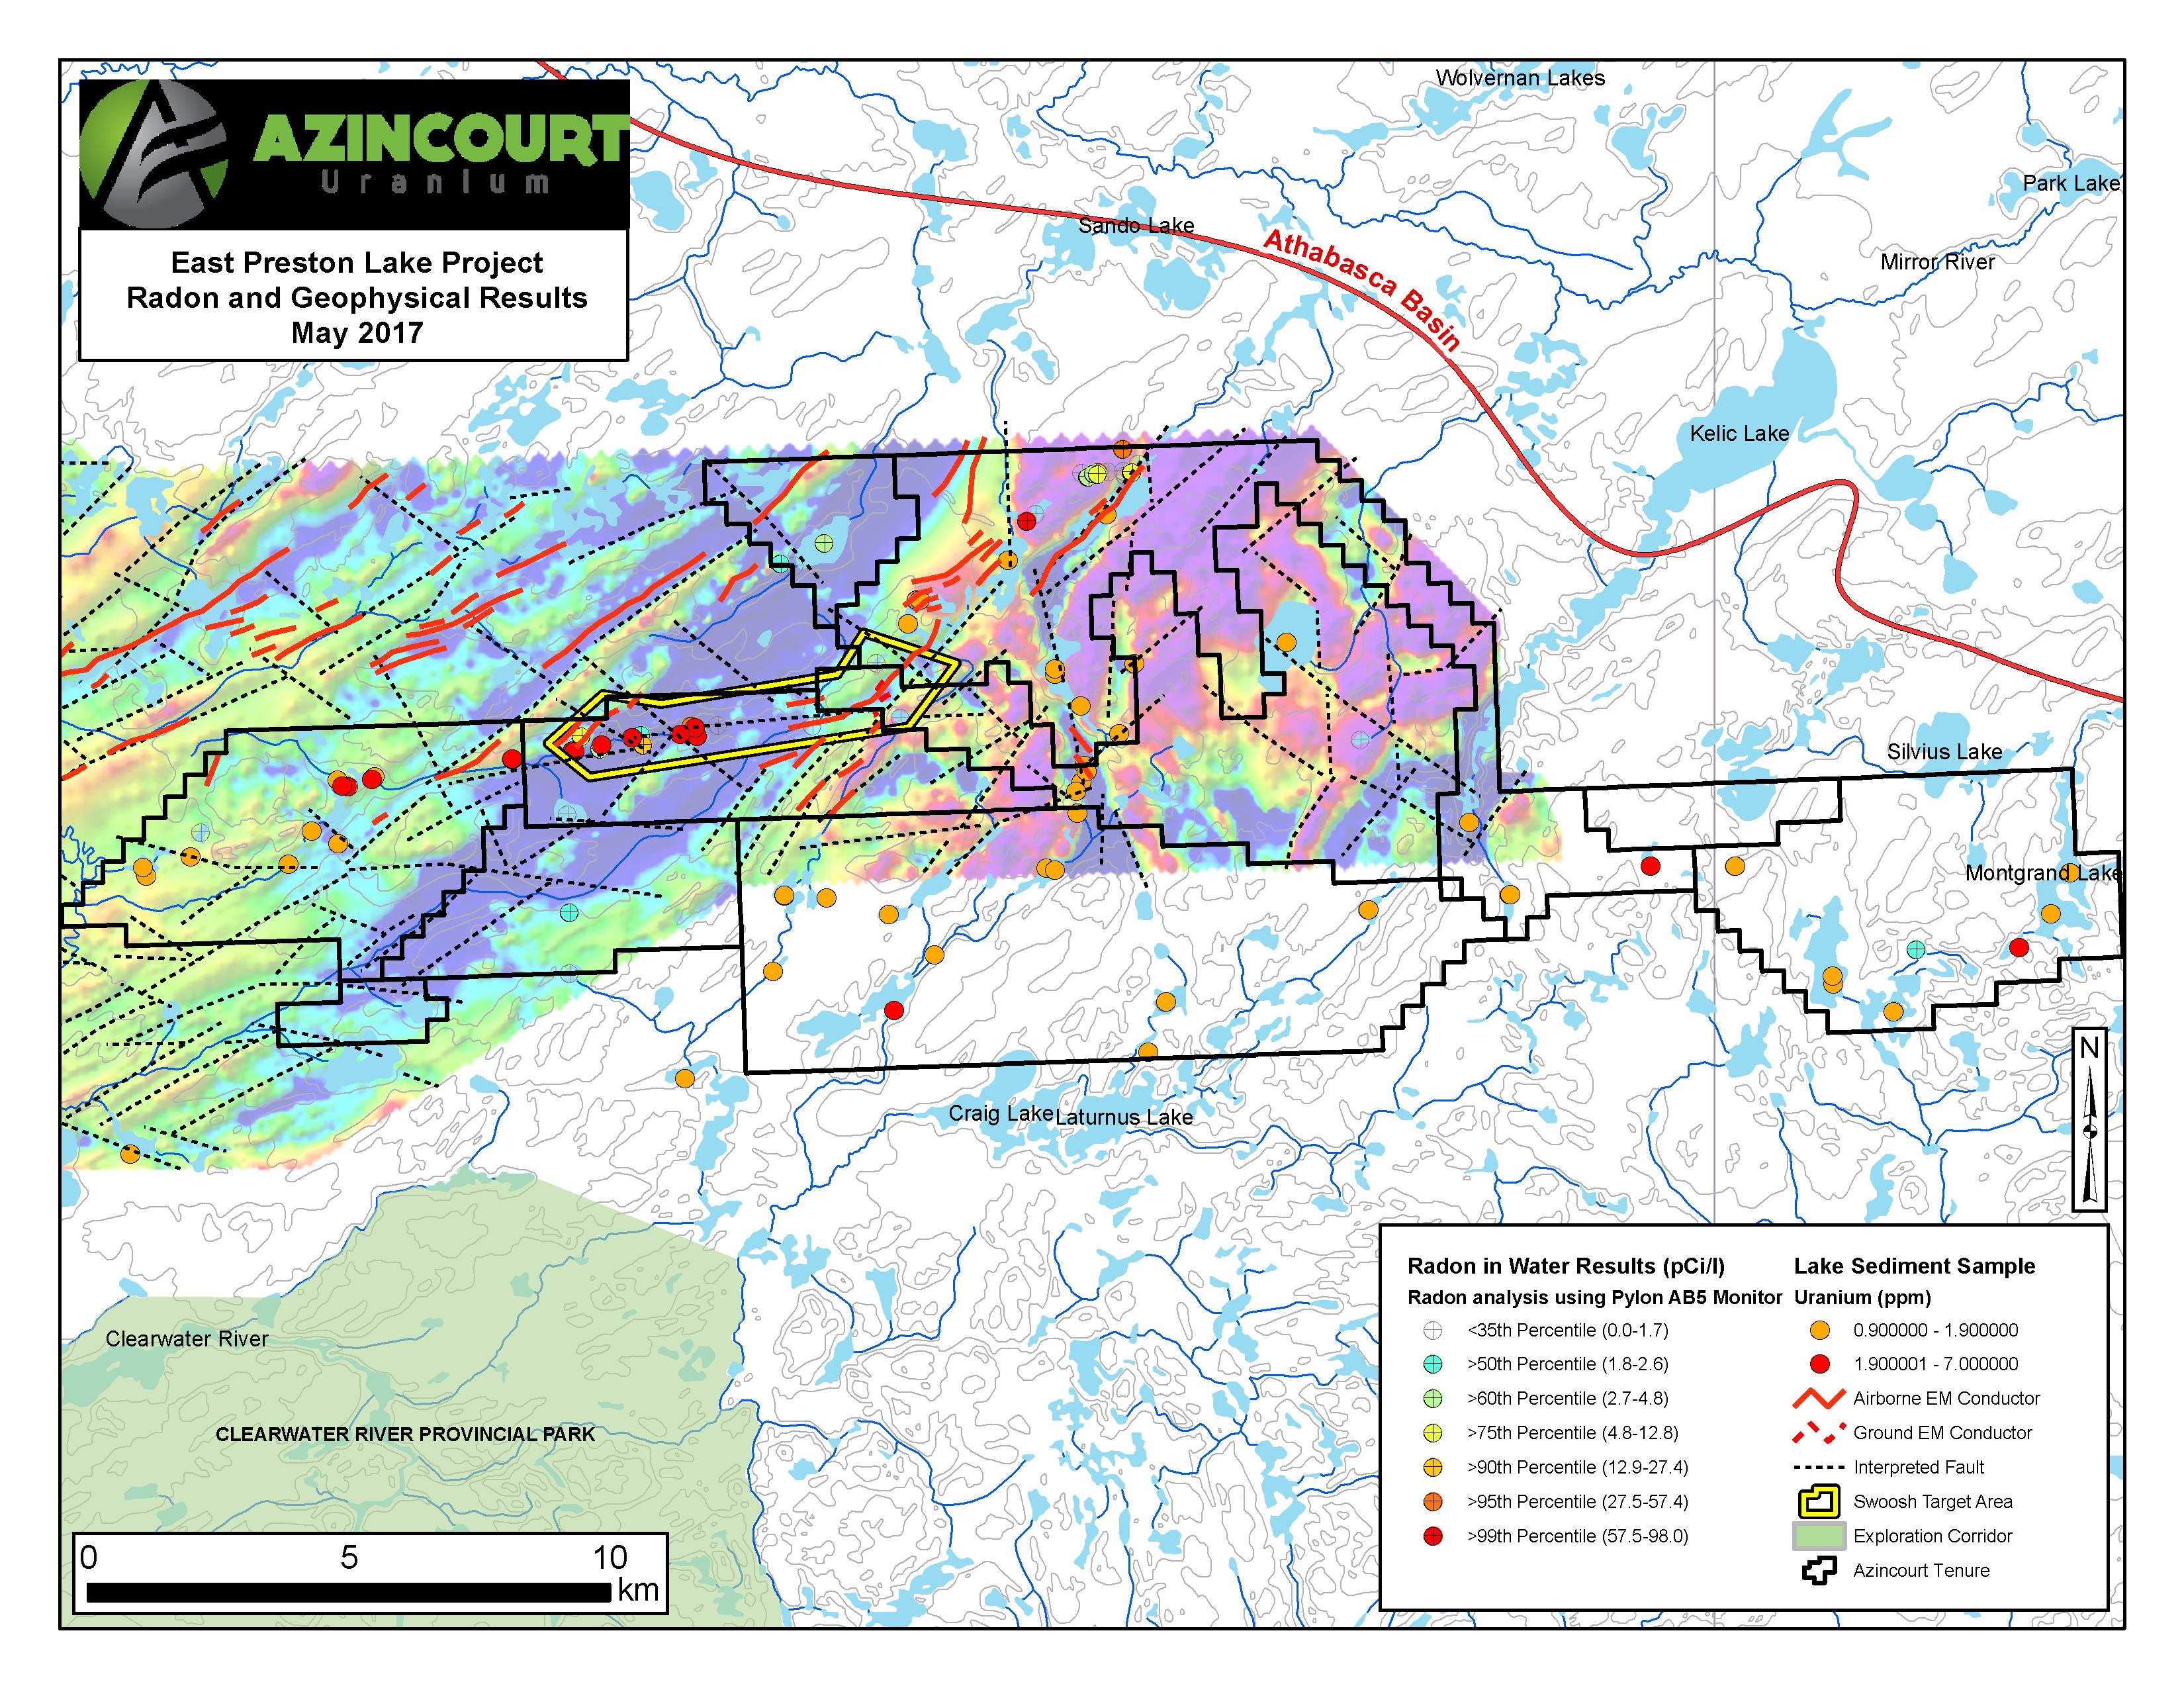 azincourt-energy-corp-map-2